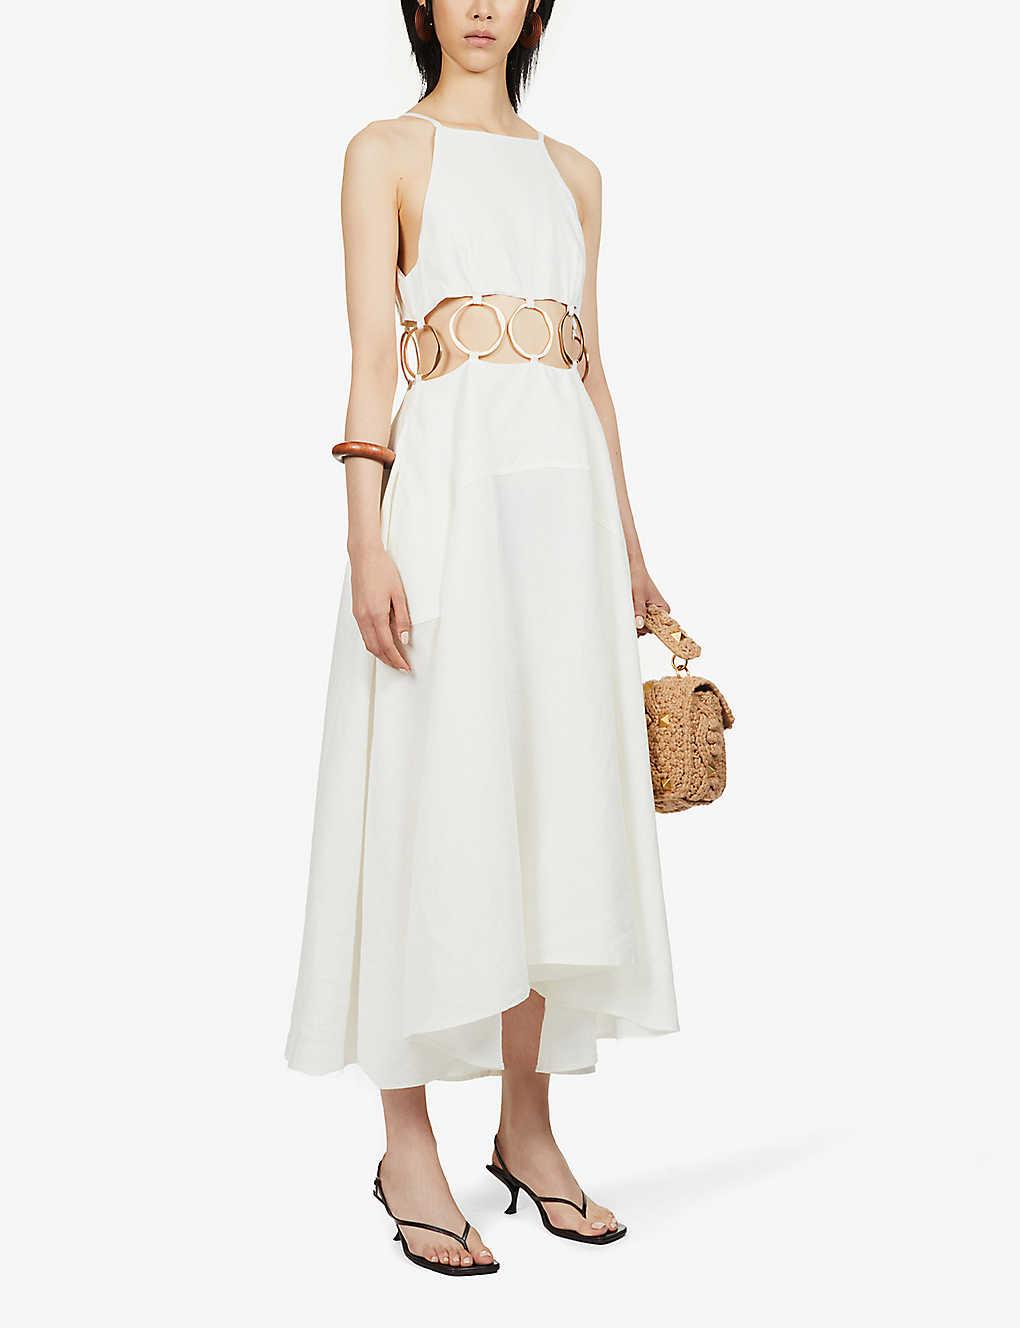 Rory cut-out linen maxi dress